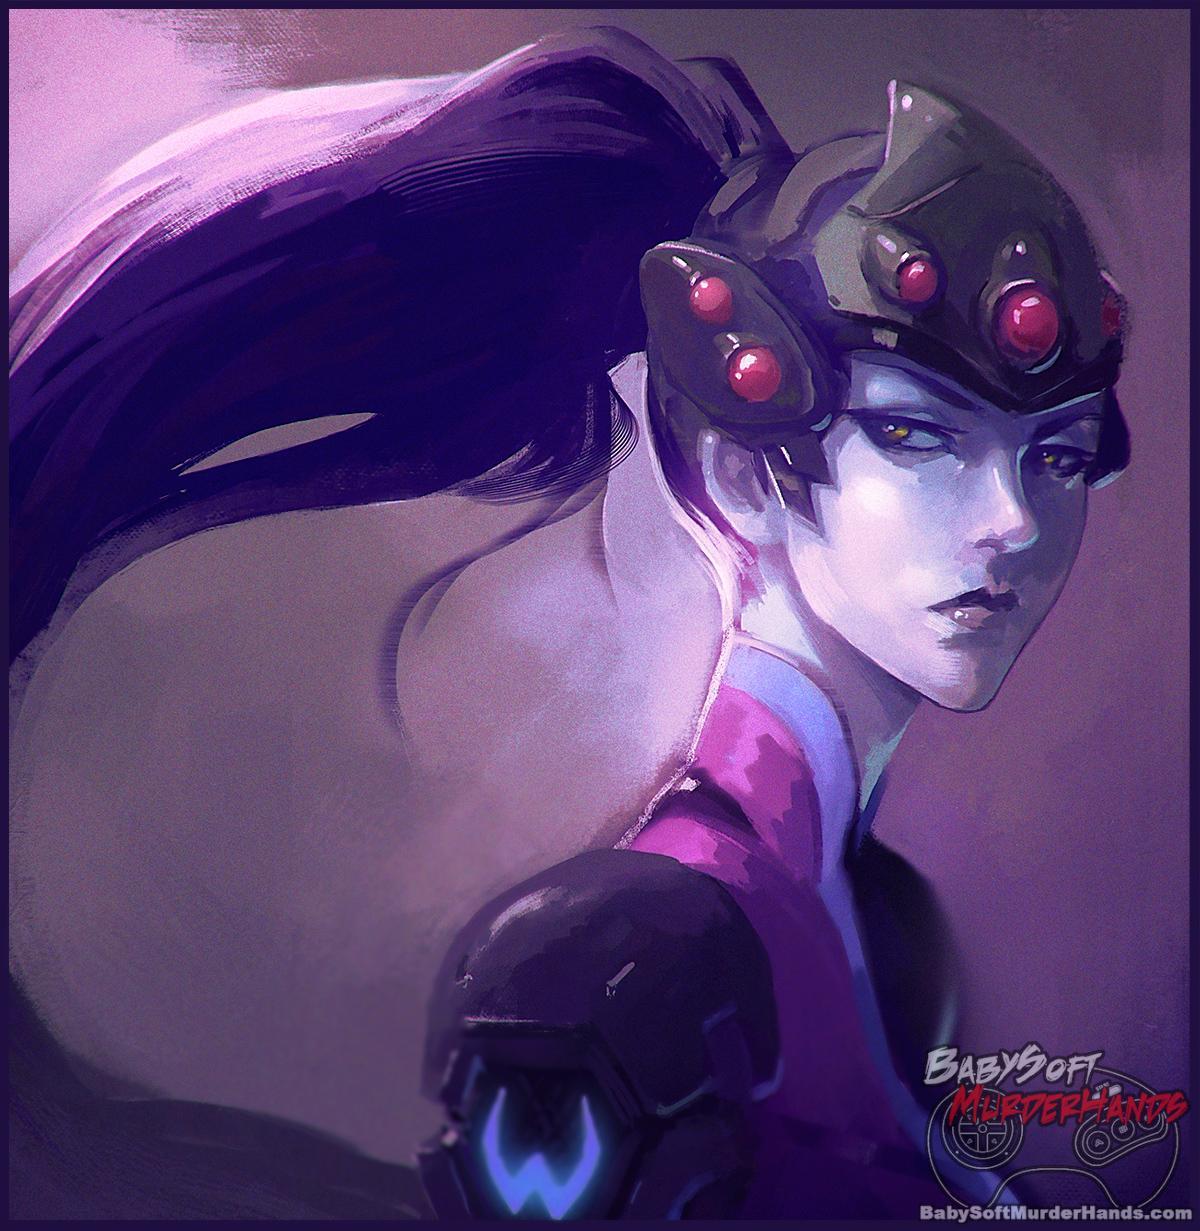 Widowmaker | ne0shin [pixiv] http://www.pixiv.net/member_illust.php?mode=medium&illust_id=52221173 Fan art